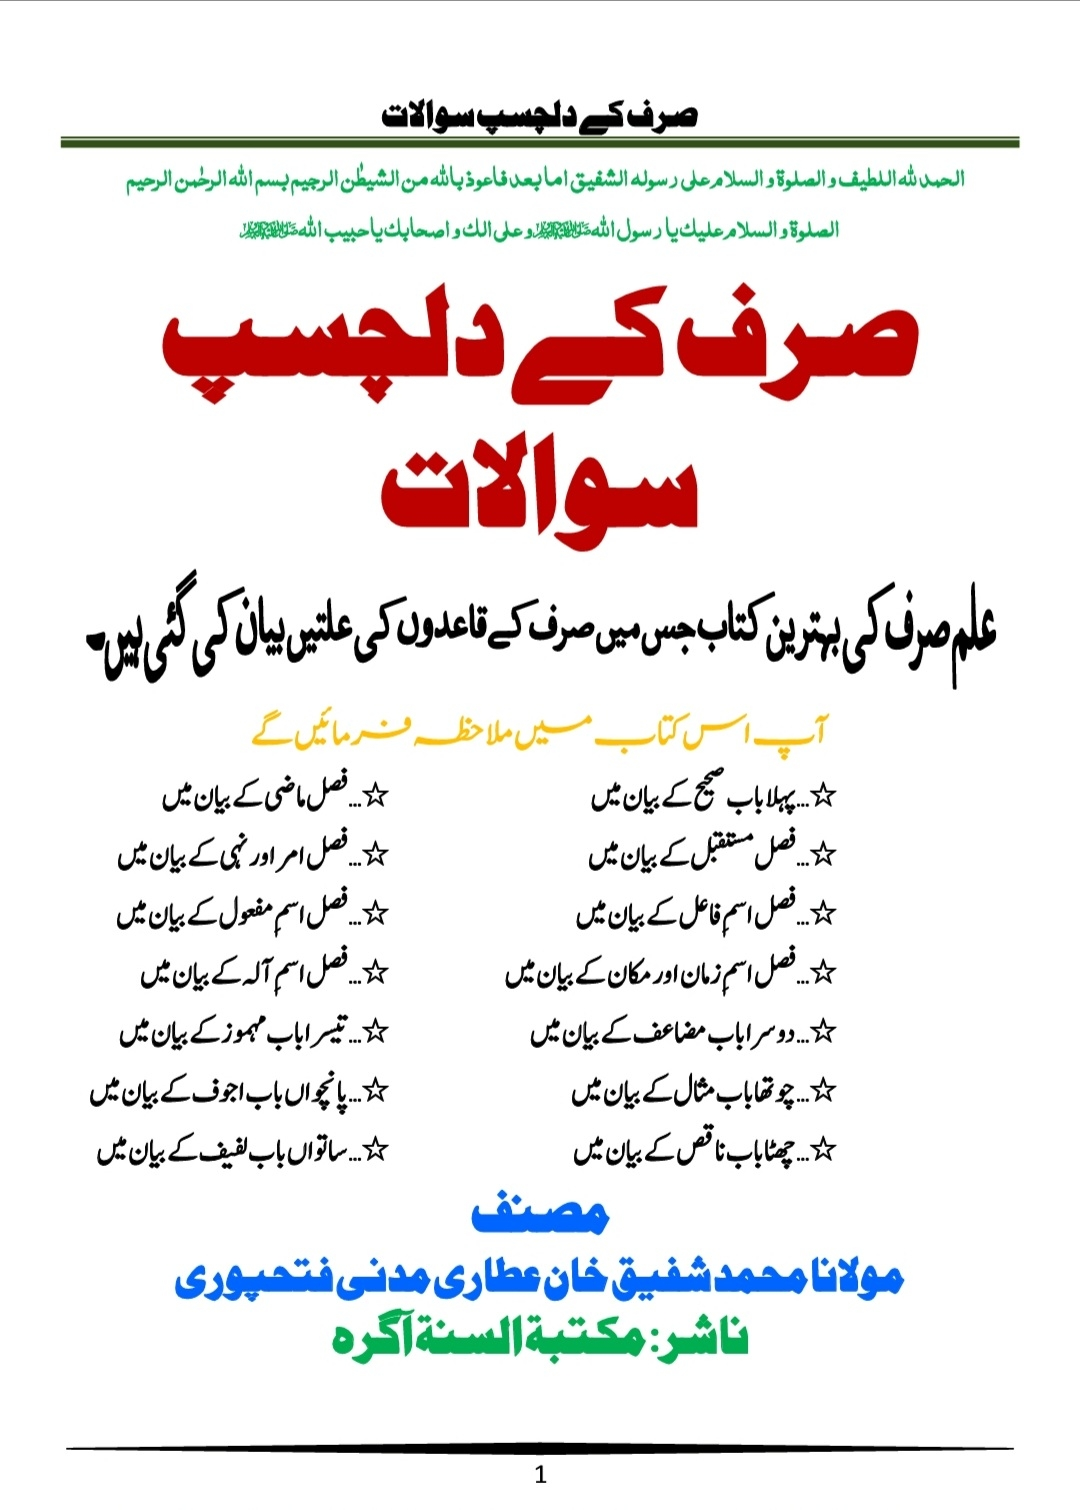 Saraf Ke Dilchasp Sawalat / صرف کے دلچسپ سوالاتby مولانا محمد شفیق خان عطاری مدنی فتحپوری